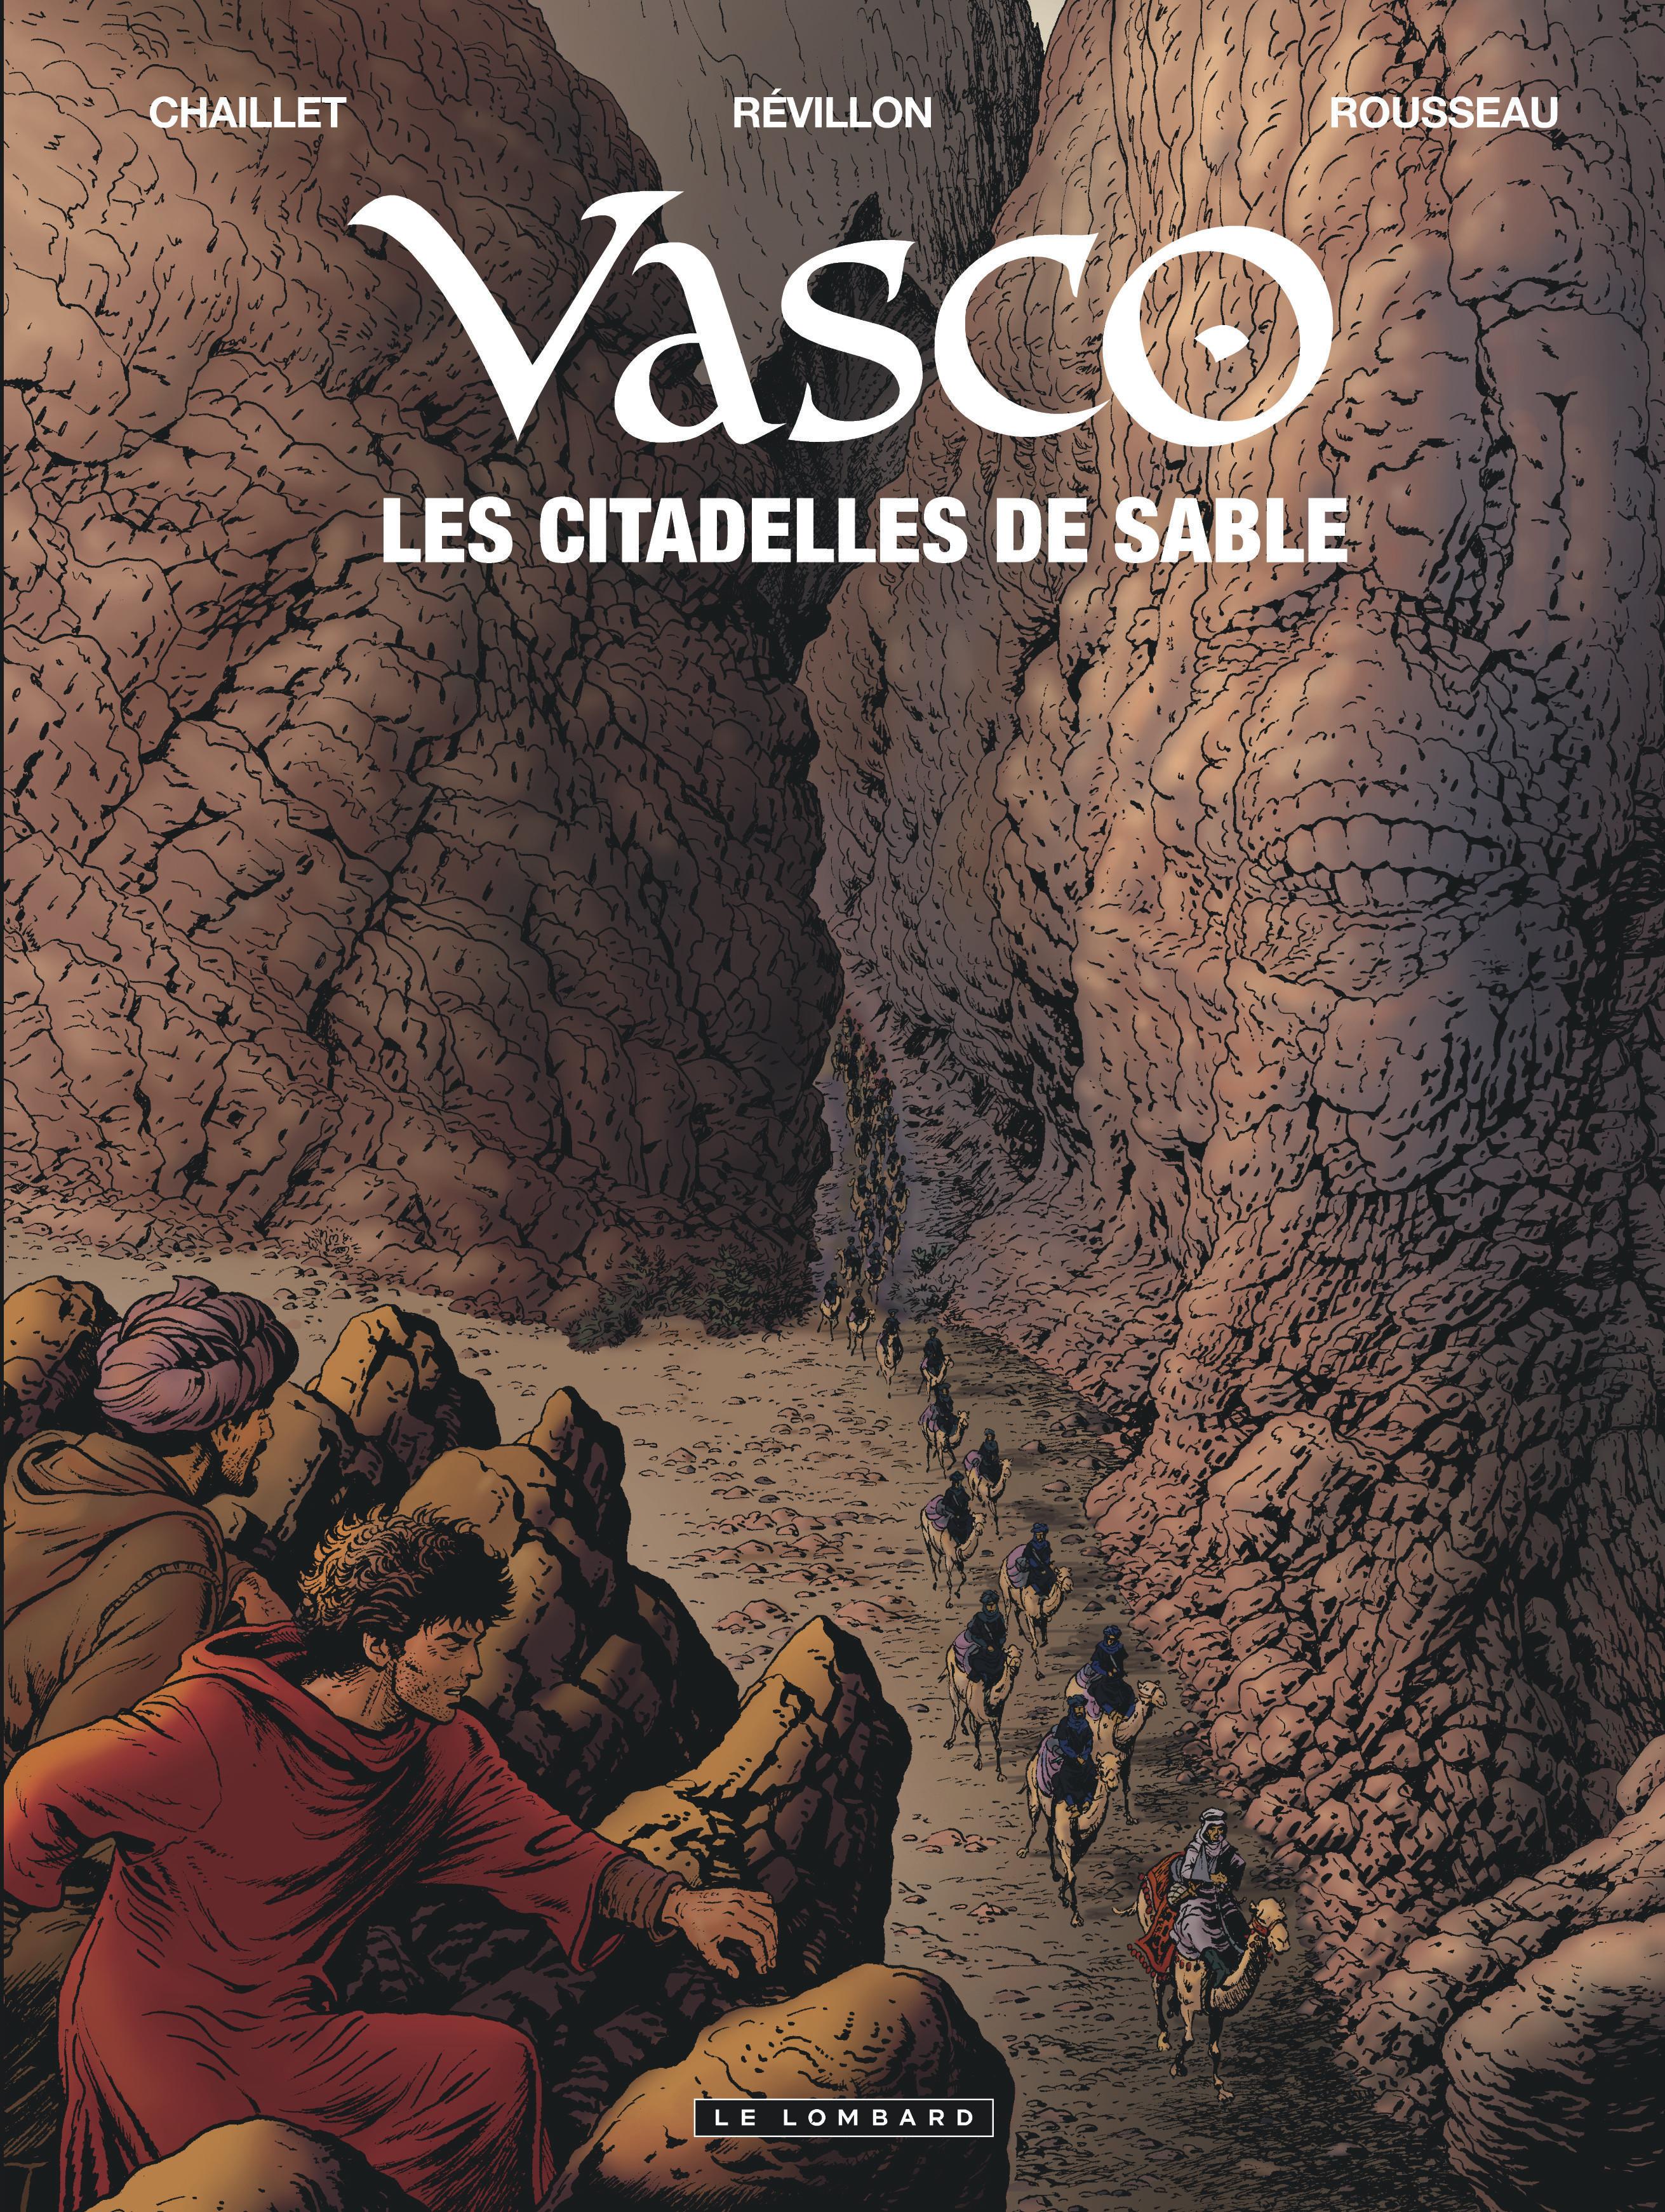 Vasco 27 - Les citadelles de sable